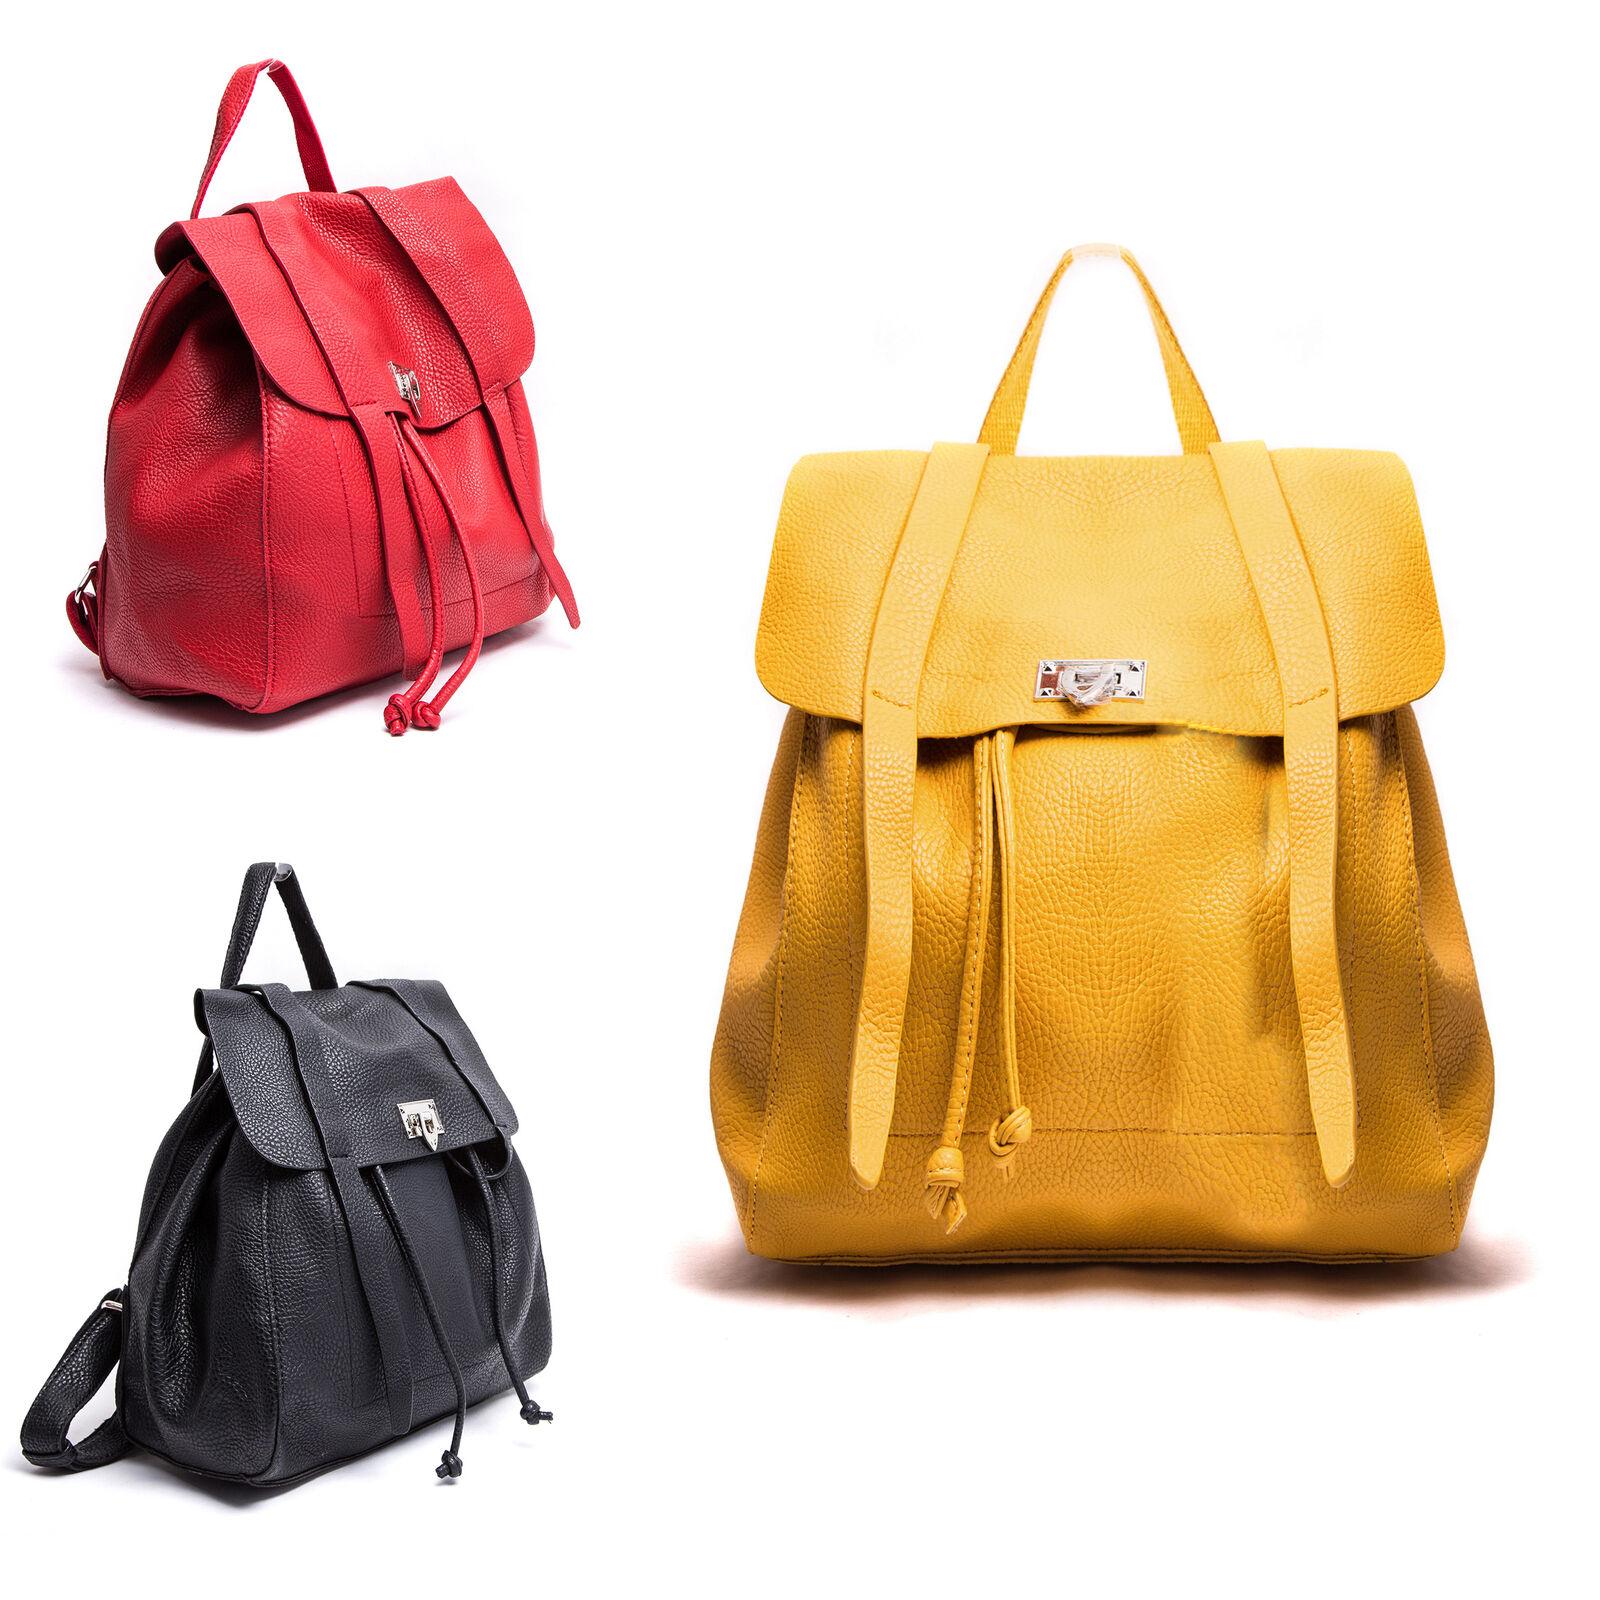 ZAINO DONNA ZAINETTO borsa eco pelle pattina hand bag vintage borsetta dsp1622 5